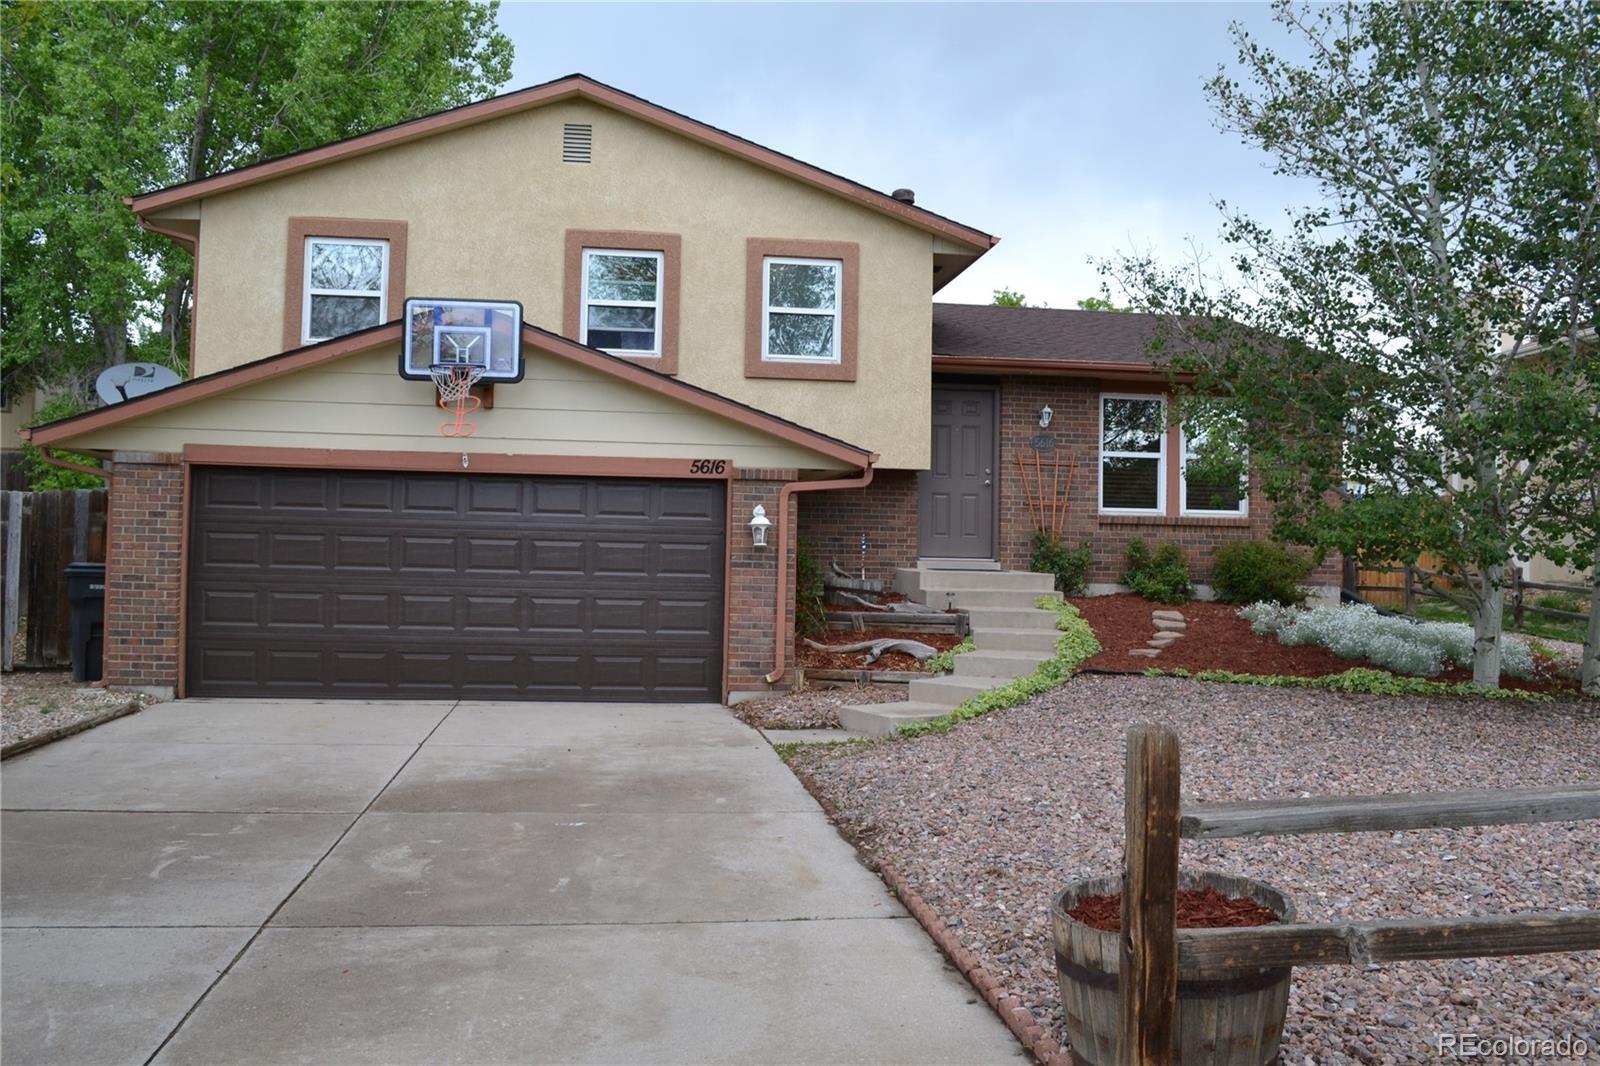 MLS# 4486712 - 19 - 5616 Trout Creek Pass Drive, Colorado Springs, CO 80917